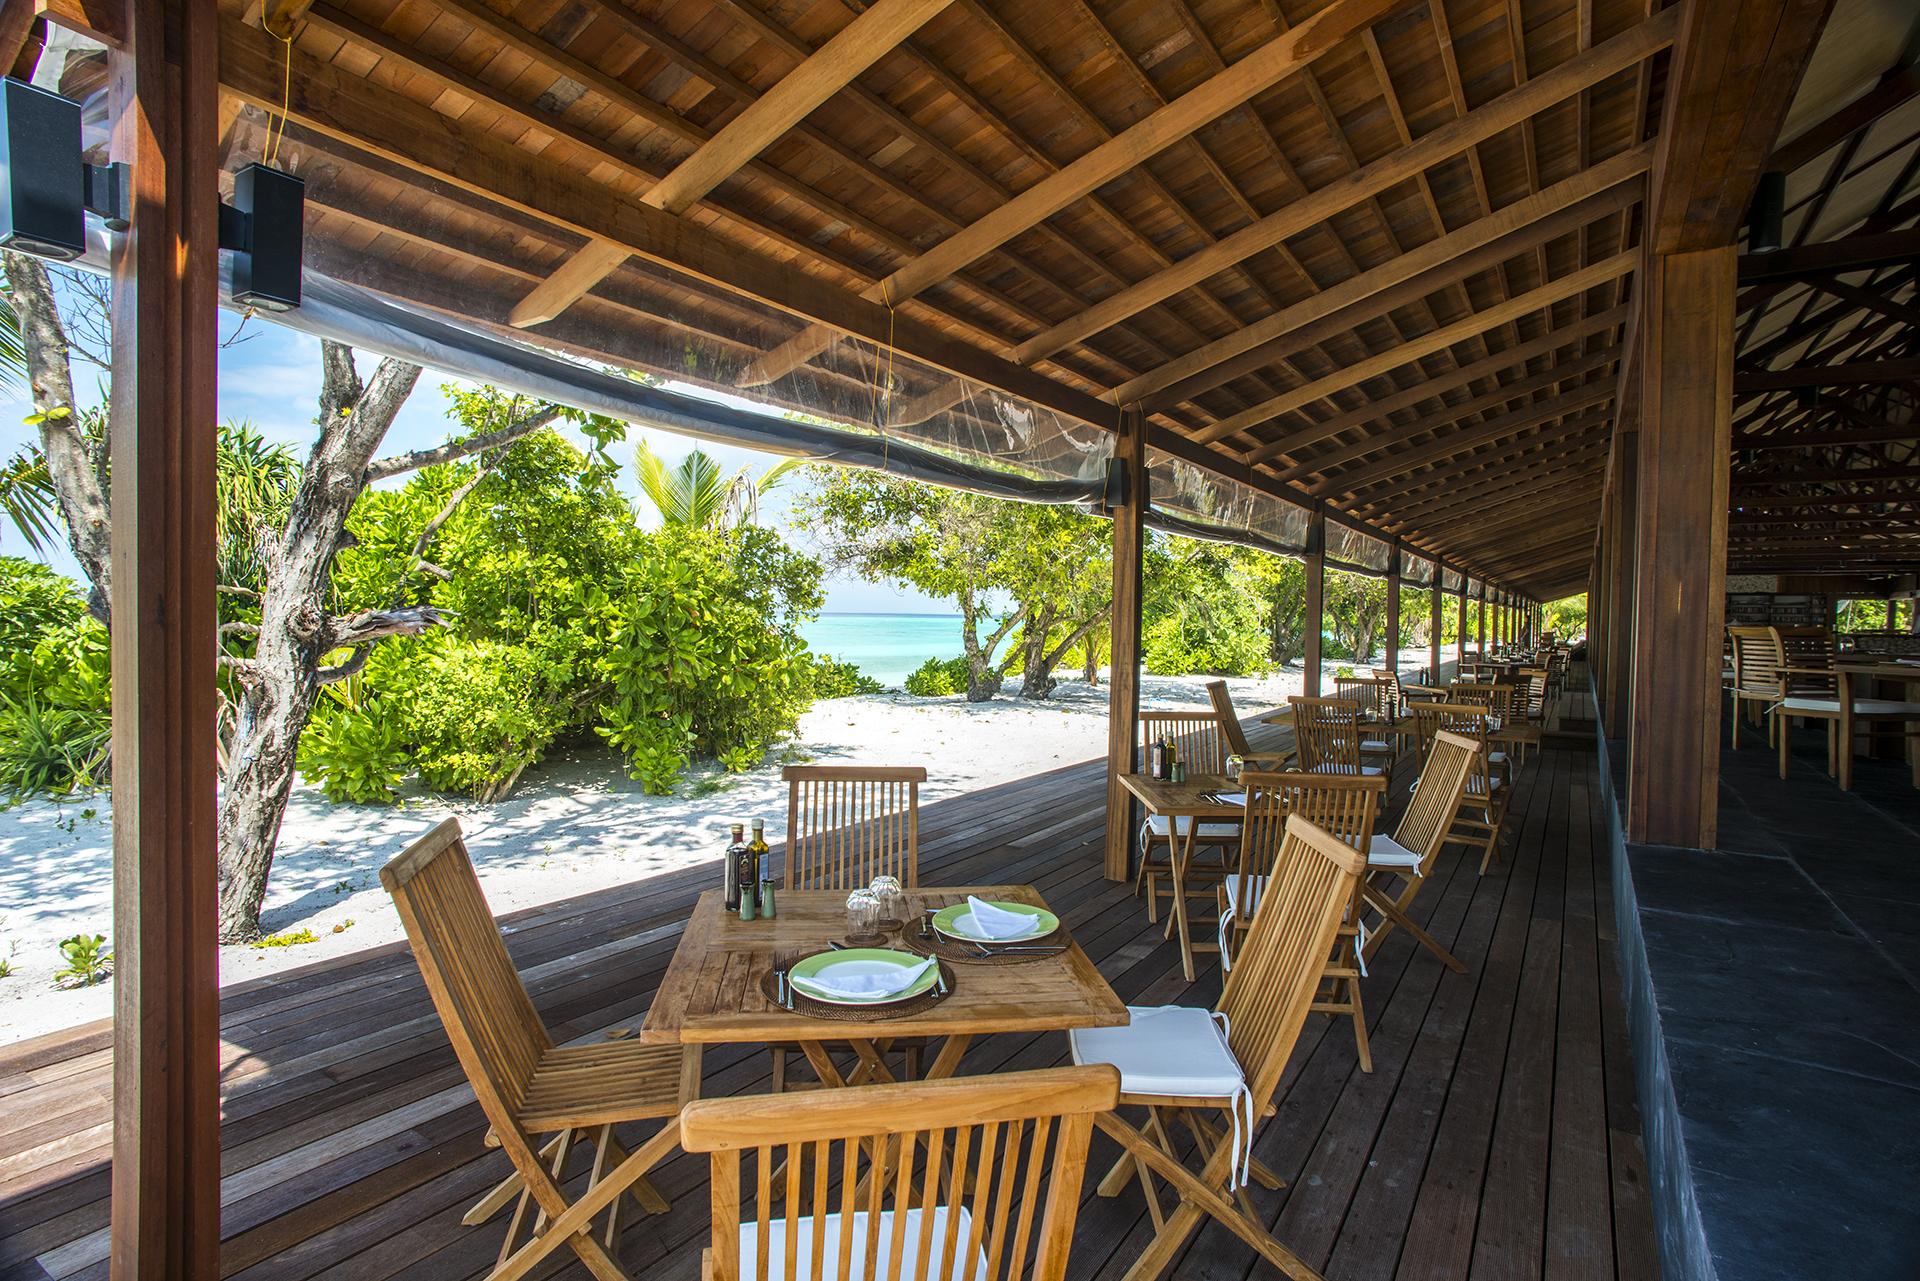 Barefoot_Resort-Maldive-Ristorante-Wadi_Destination.jpg